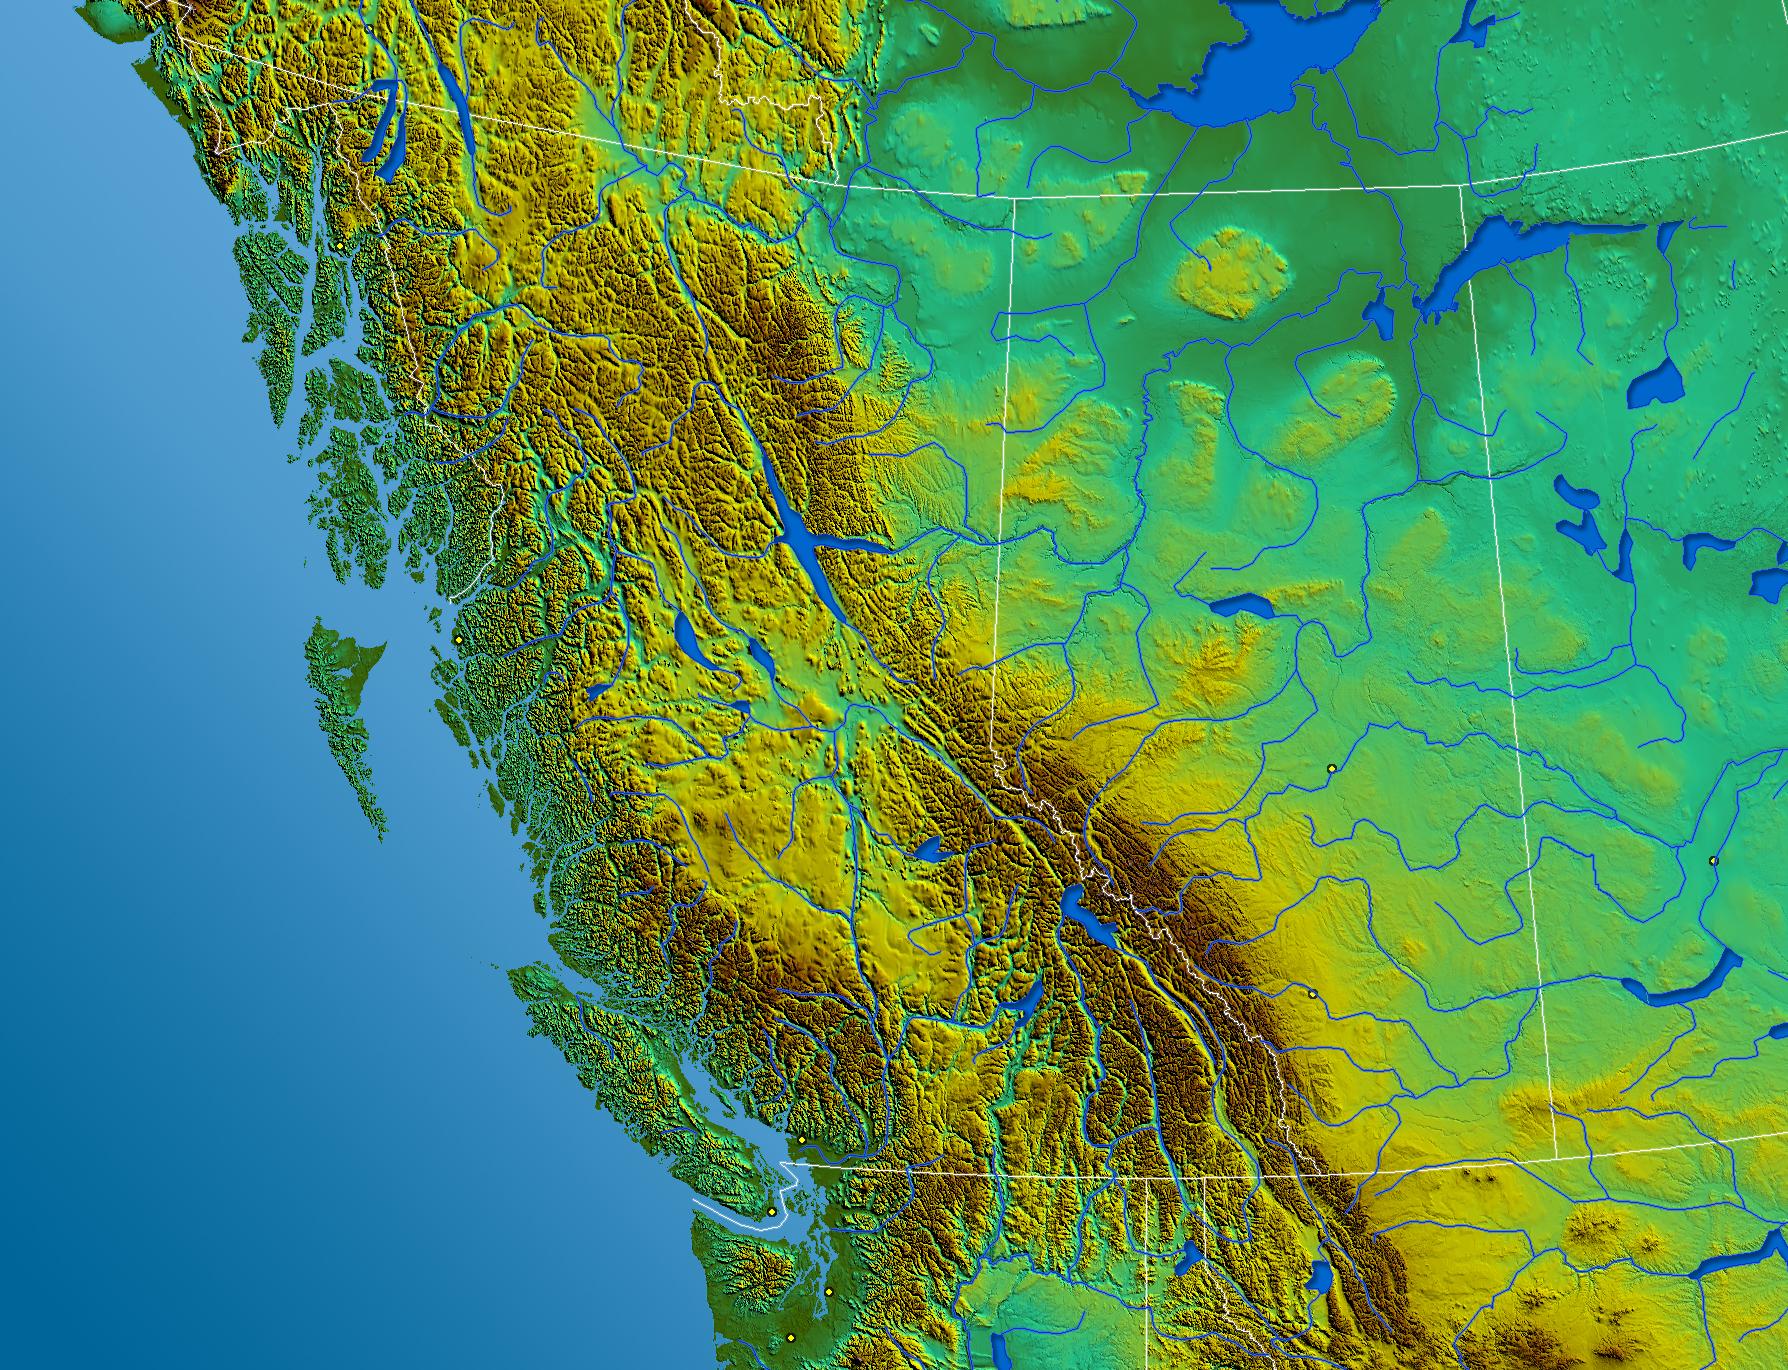 Map Western Canada File:South West Canada.   Wikipedia